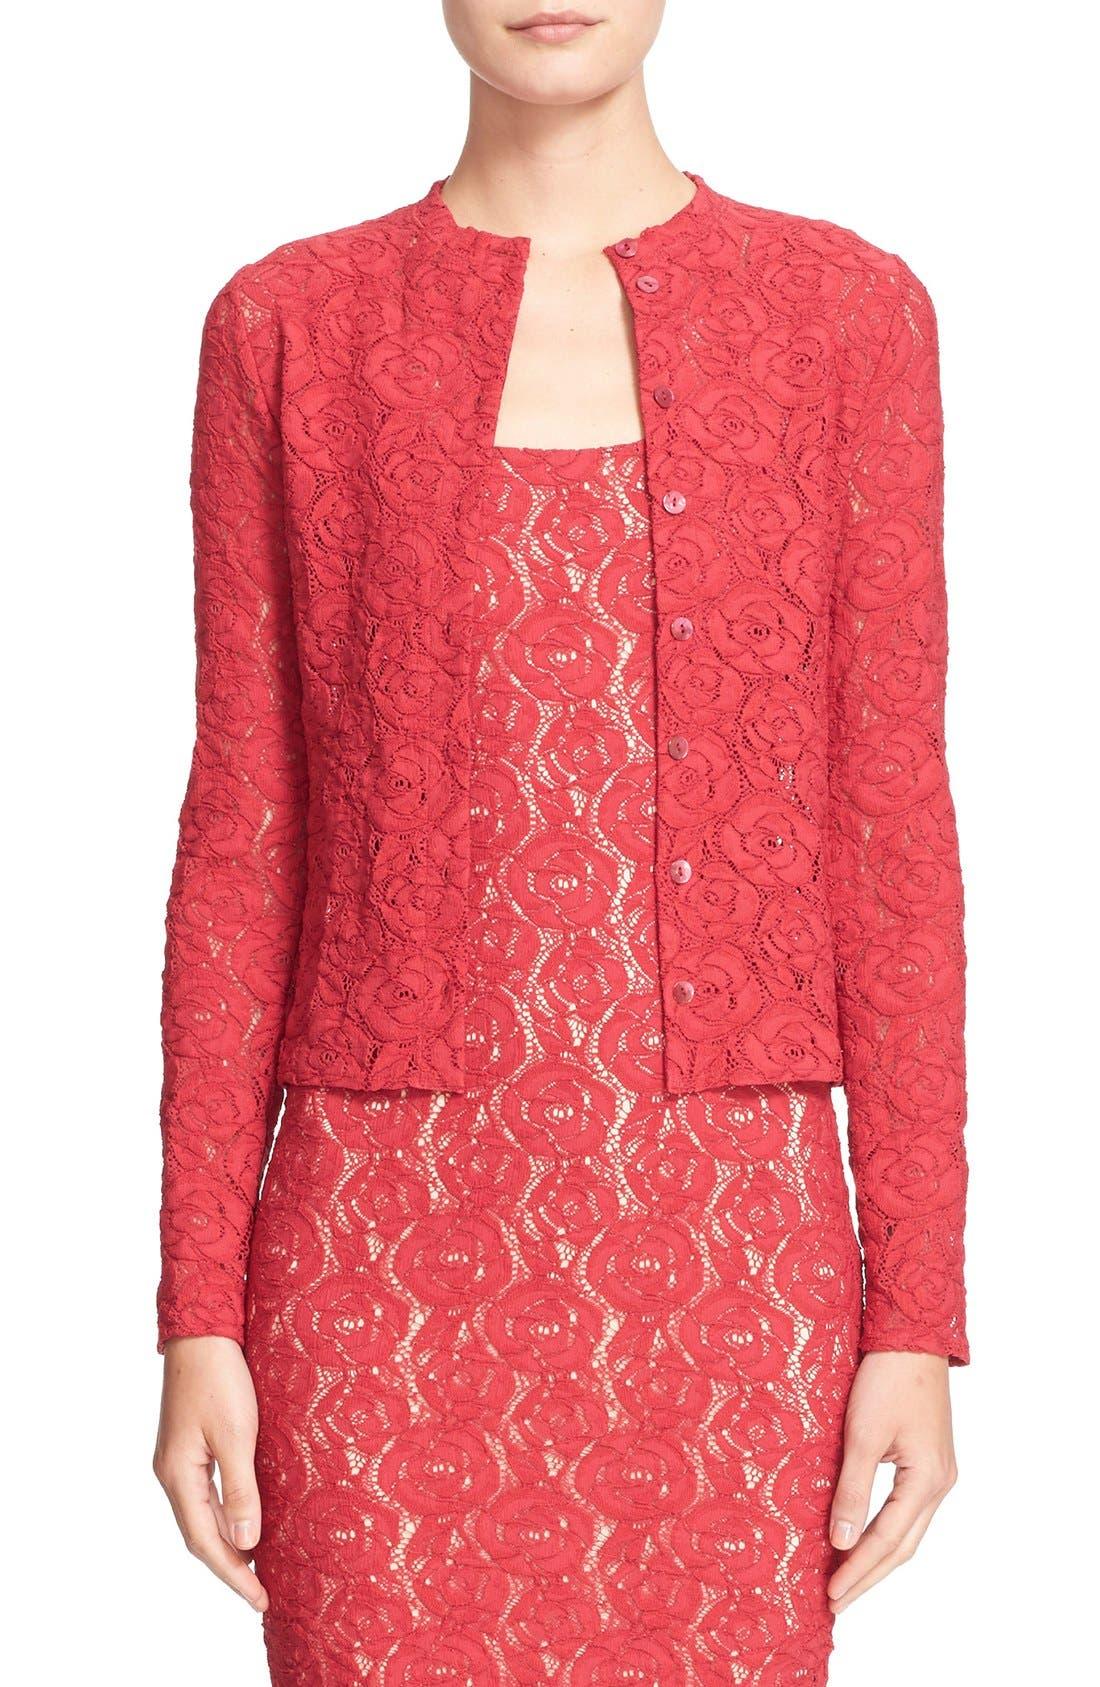 Main Image - Fuzzi Floral Lace Cardigan